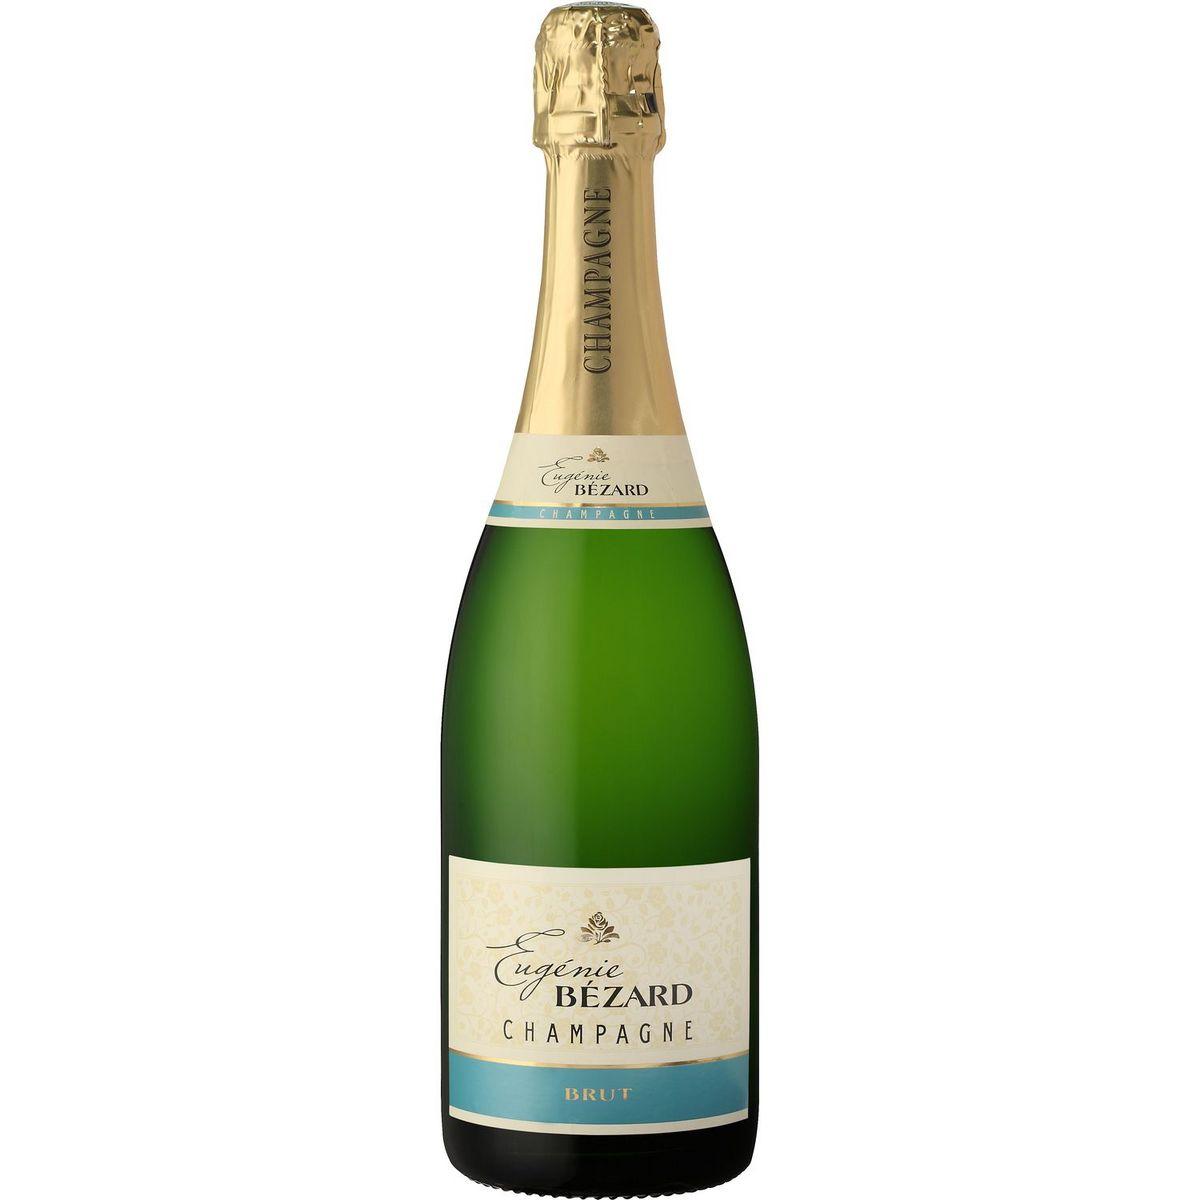 Eugénie Bézard Champagne brut